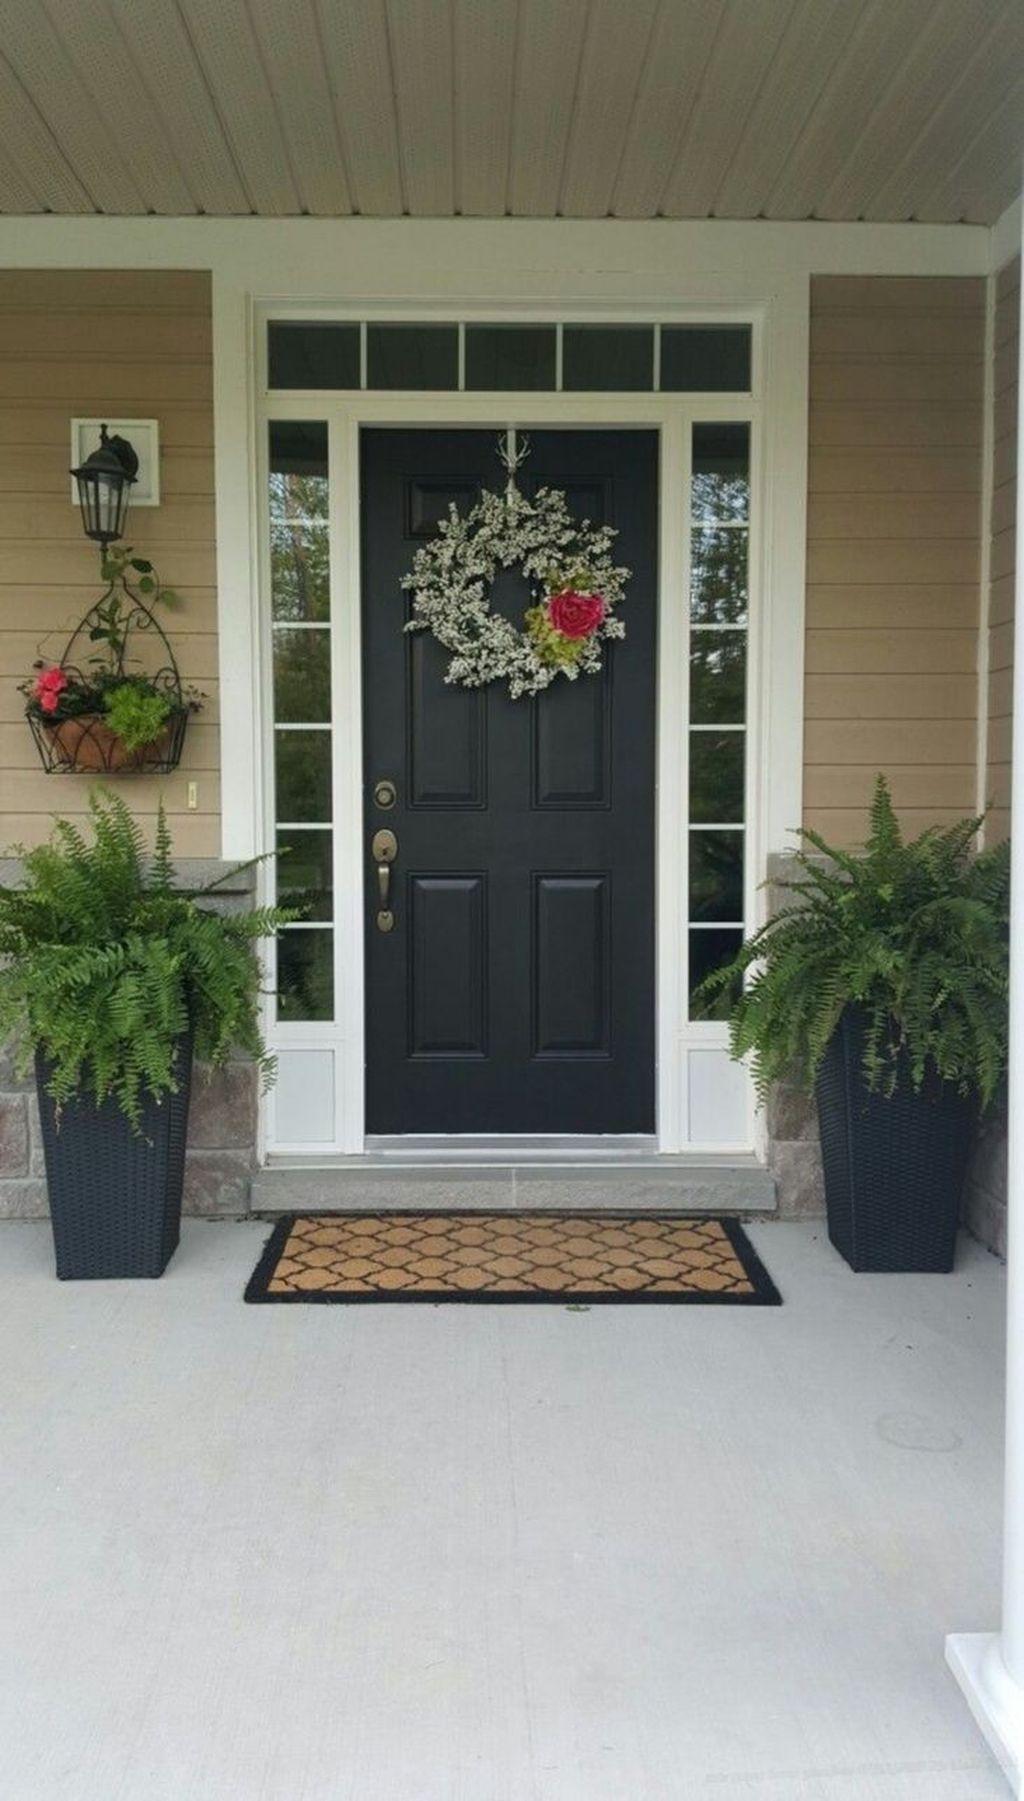 Inspiring Spring Planters Design Ideas For Front Door 22